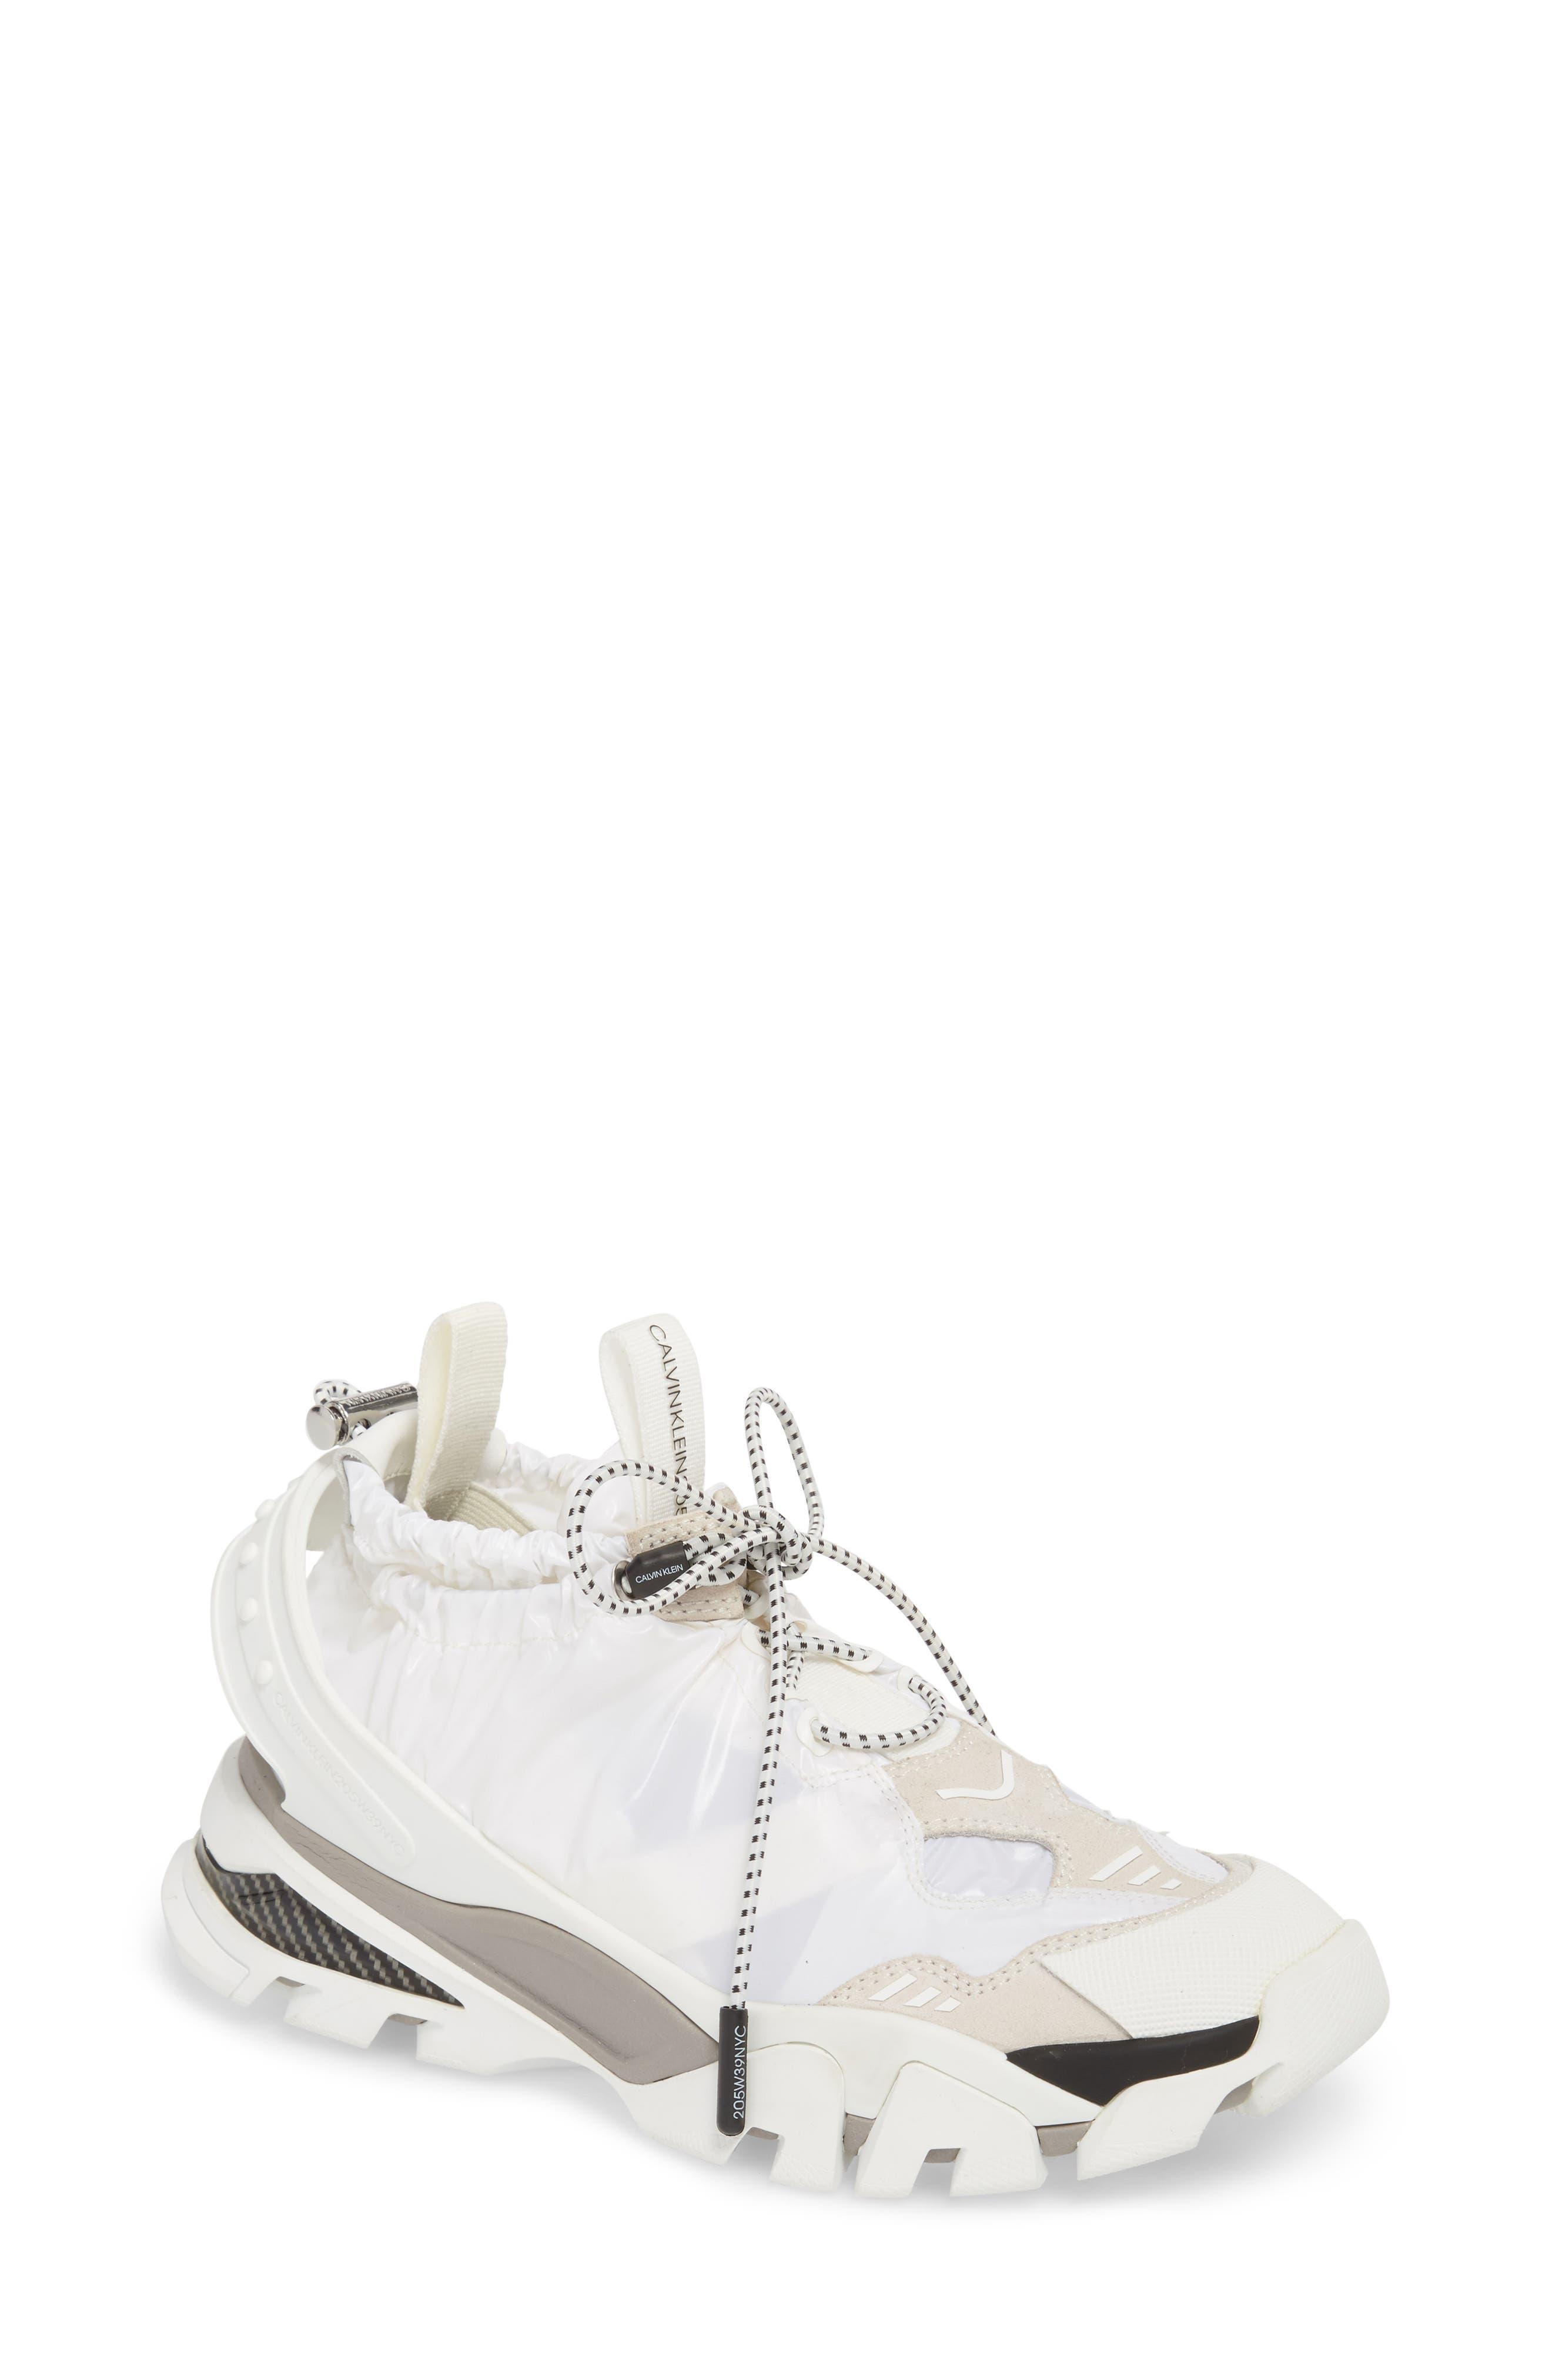 CALVIN KLEIN 205W39NYC Candessa Slip-On Sneaker, Main, color, 100